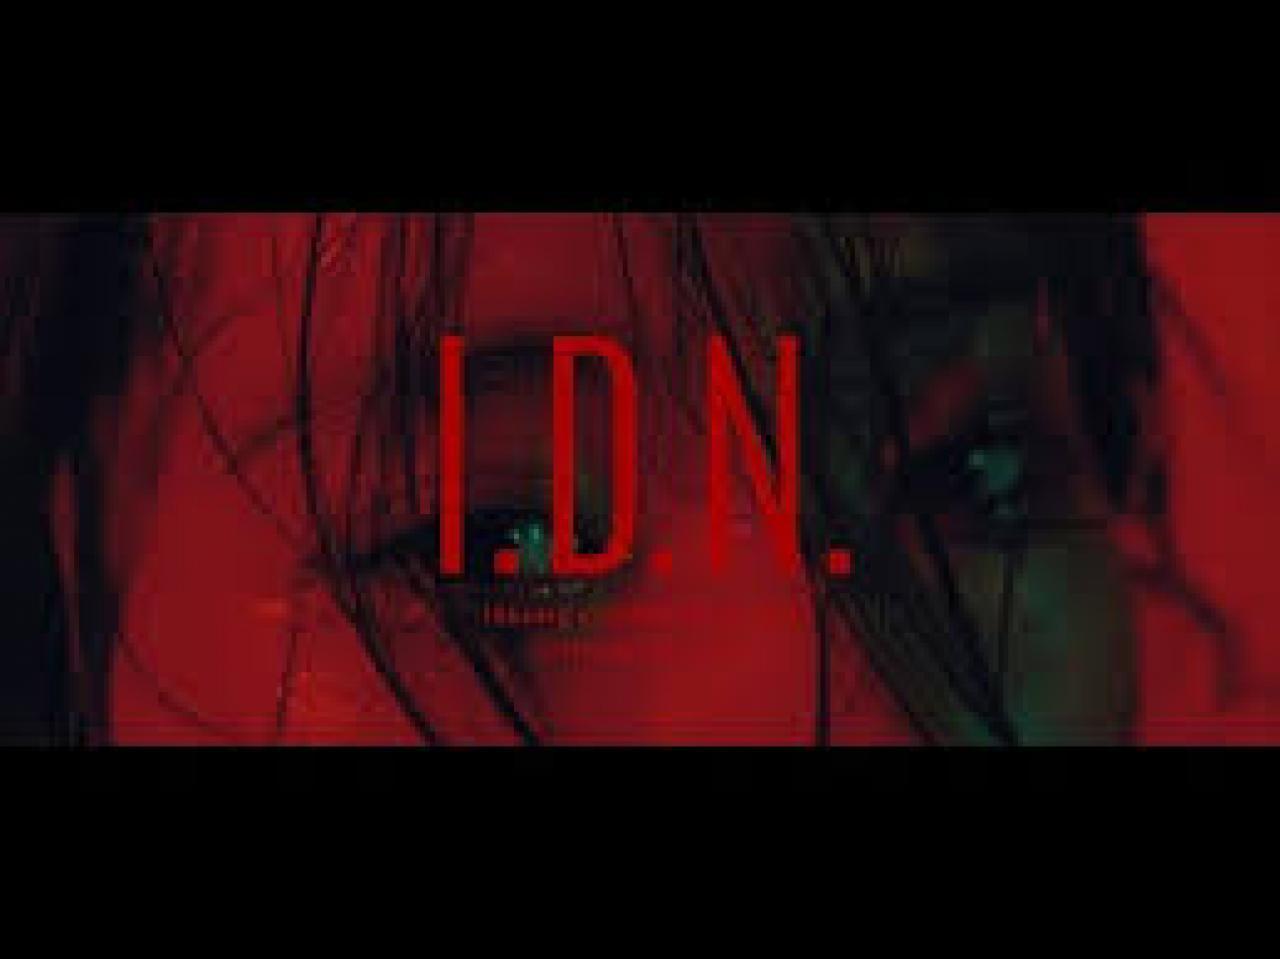 18scott x SUNNOVA – I.D.N. feat. BASI